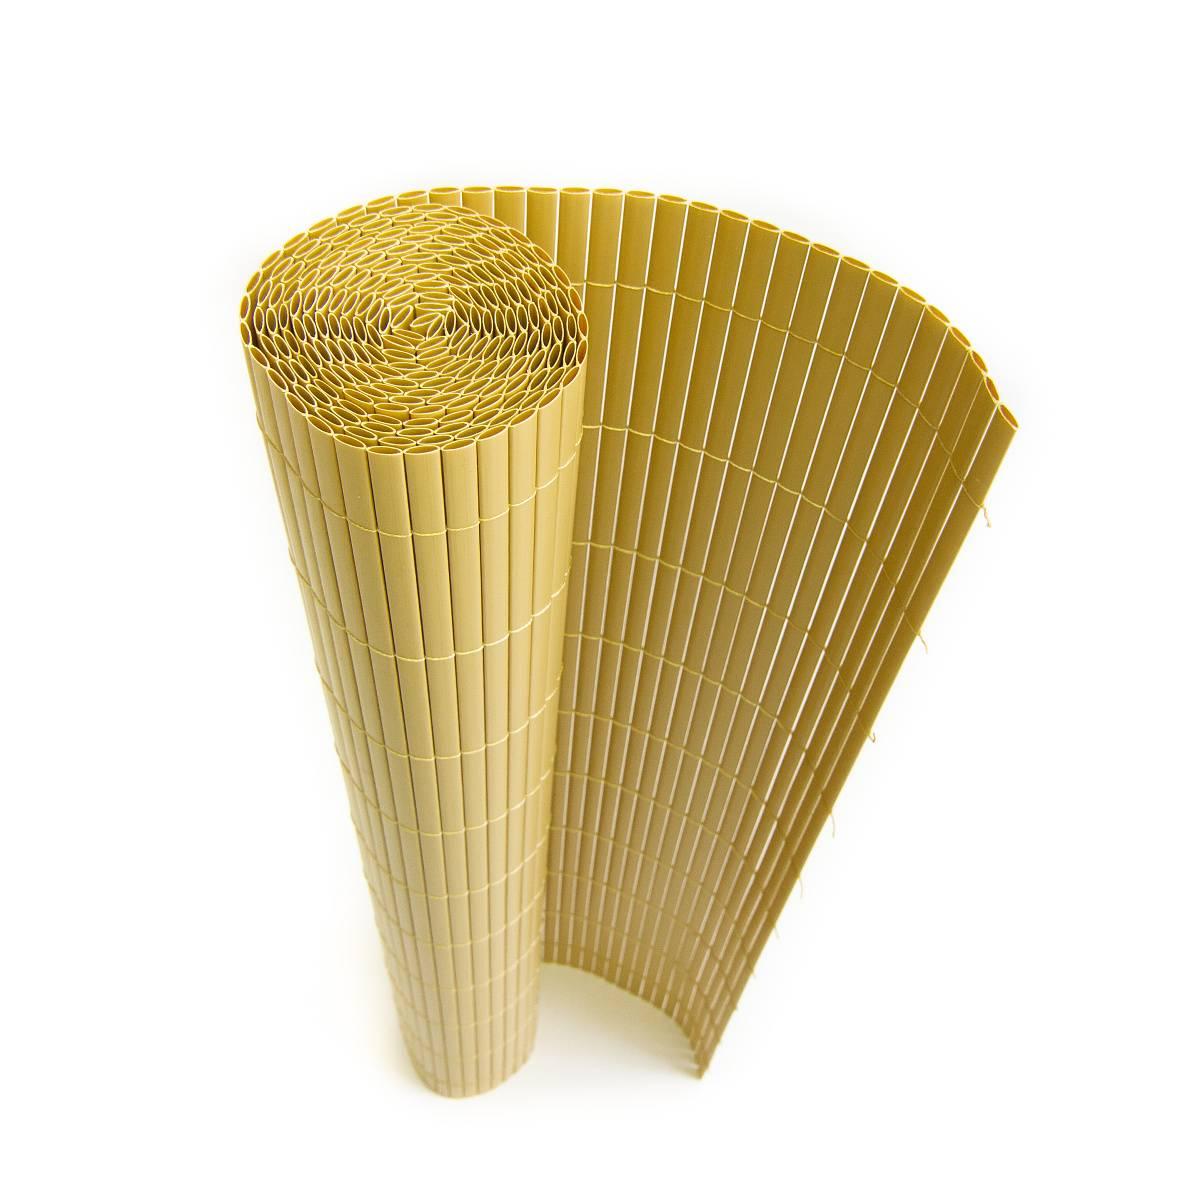 Bambusová rohož - BAMBOO MAT - Y, výška 1,0 m